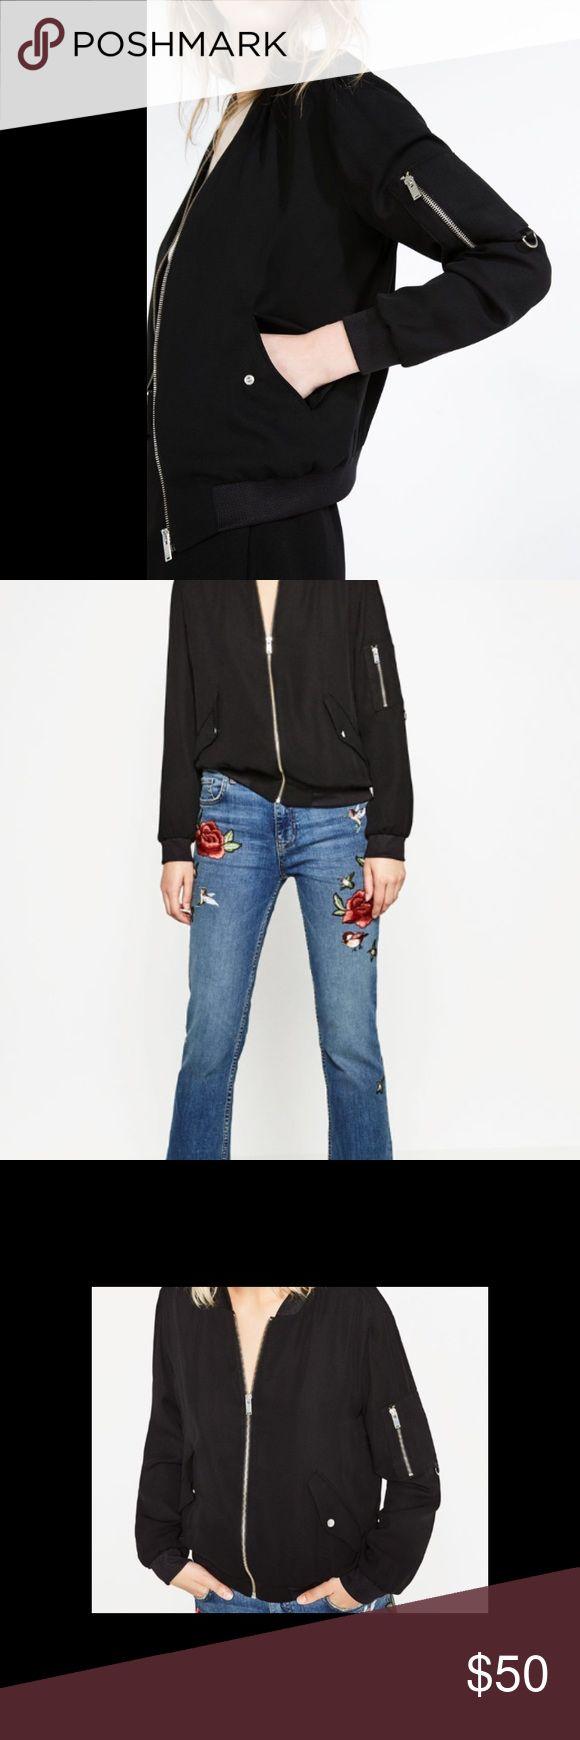 Zara Bomber Jacket Black flows Zara Bomber Jacket- worn only once! Perfect condition and great flowy fabric Zara Jackets & Coats